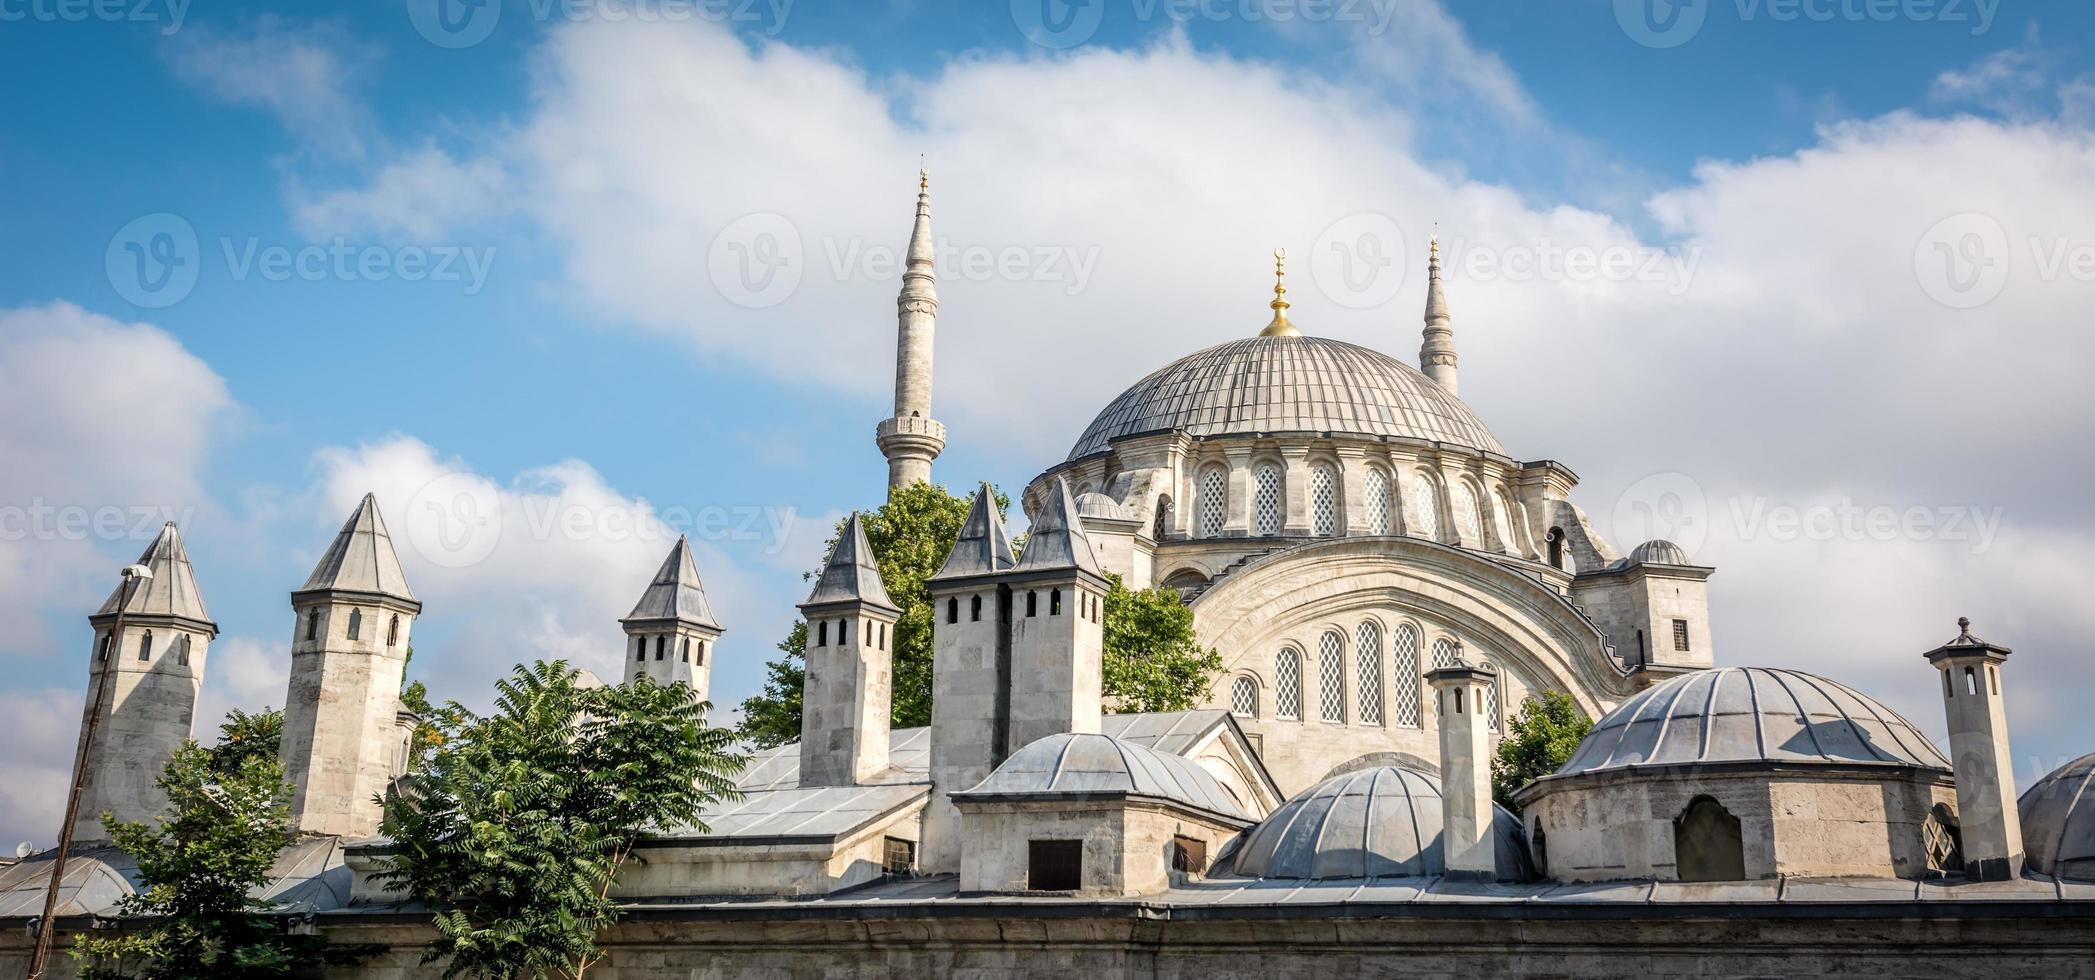 Moschea Nuruosmaniye a Istanbul, Turchia foto